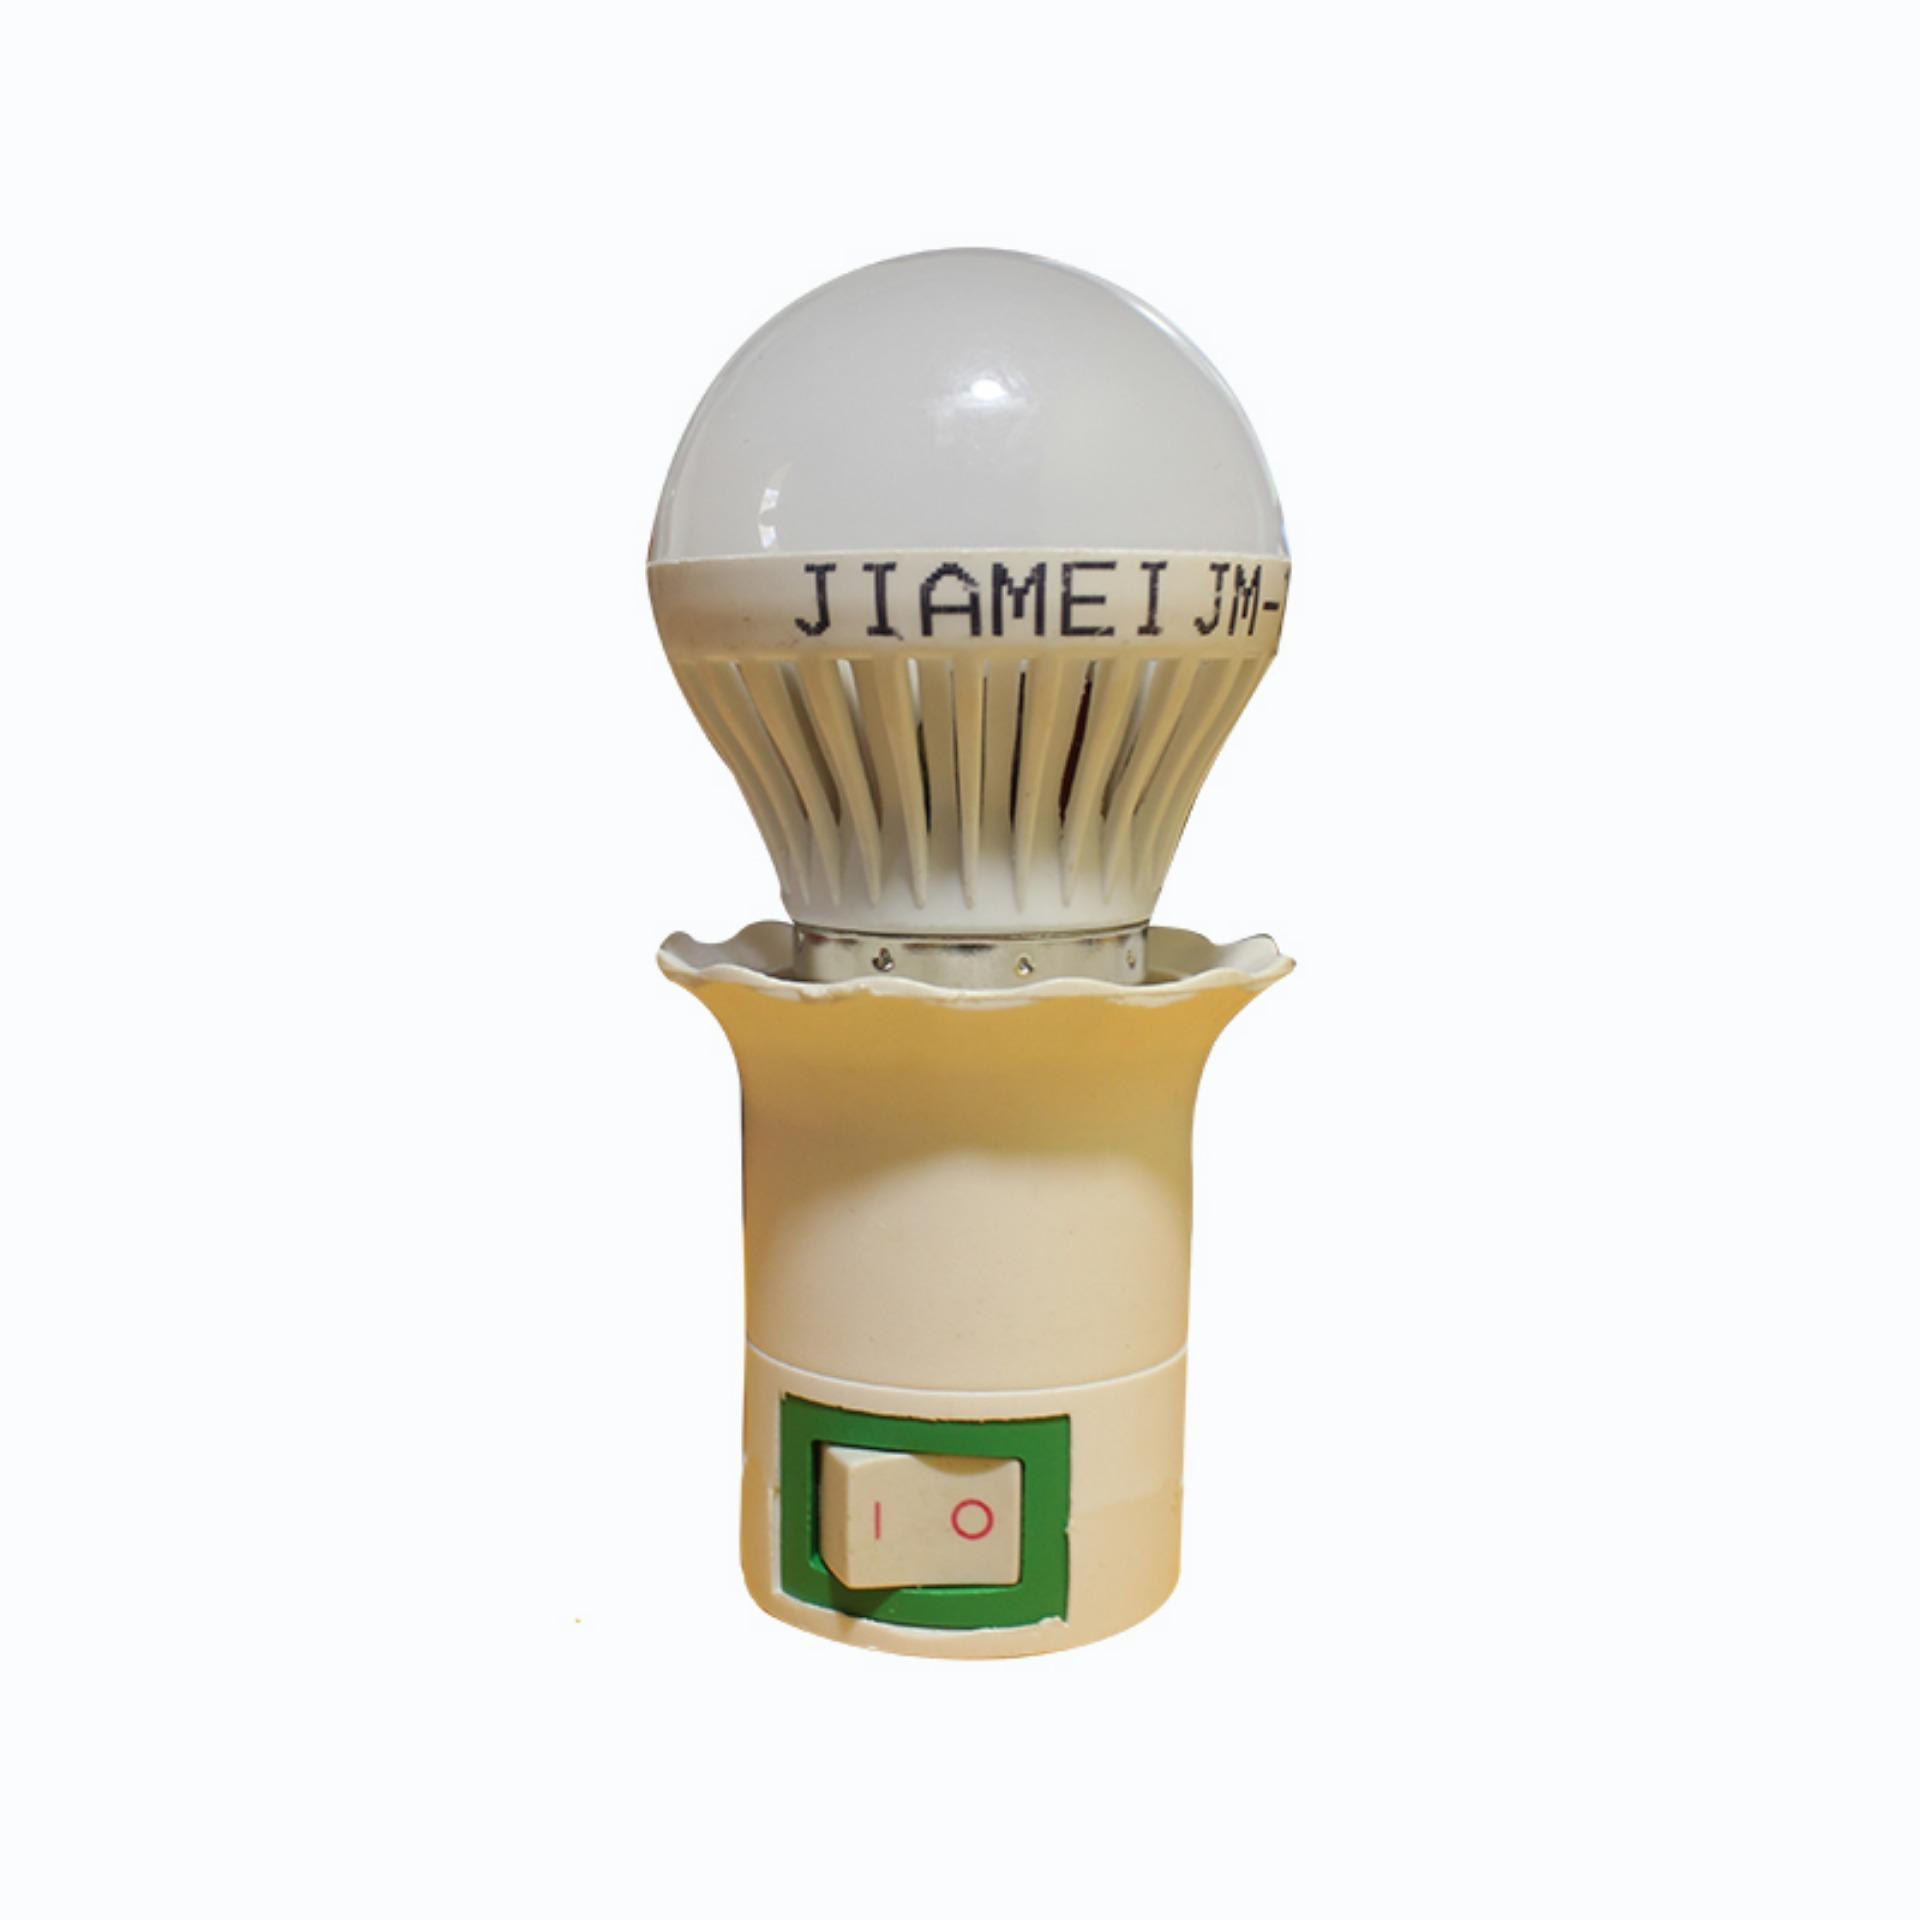 EELIC JM-828 Mini Lamp Warna Putih Lampu cantik Malam Hari Tidak Silau Di Mata dan Hemat Energi